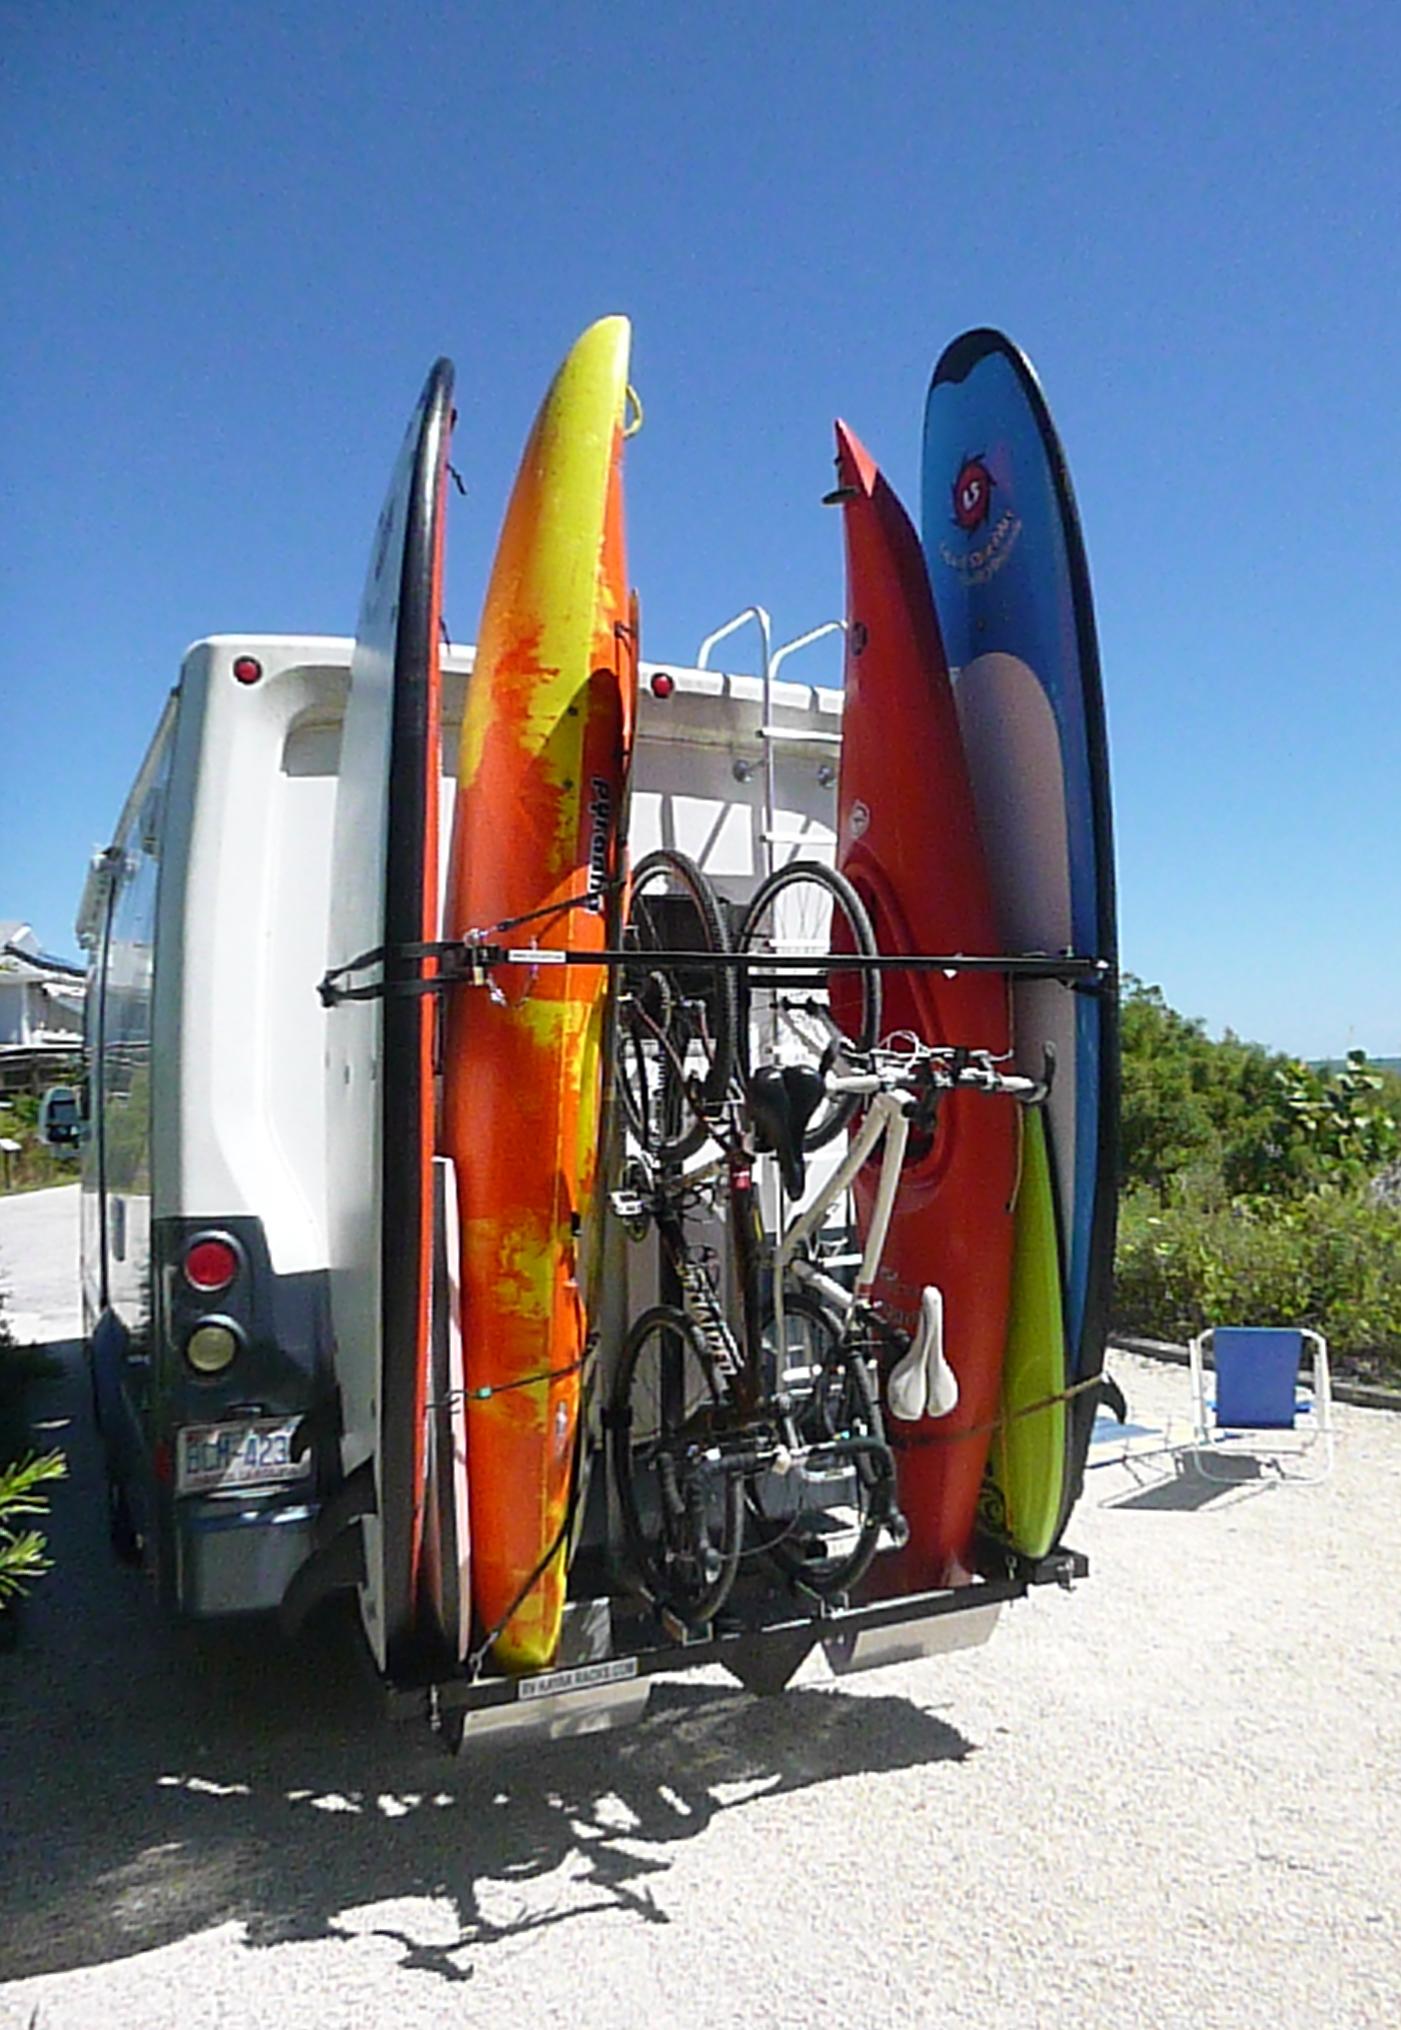 Welcome To Rvkayakracks Com The First Vertical Rv Kayak Rack